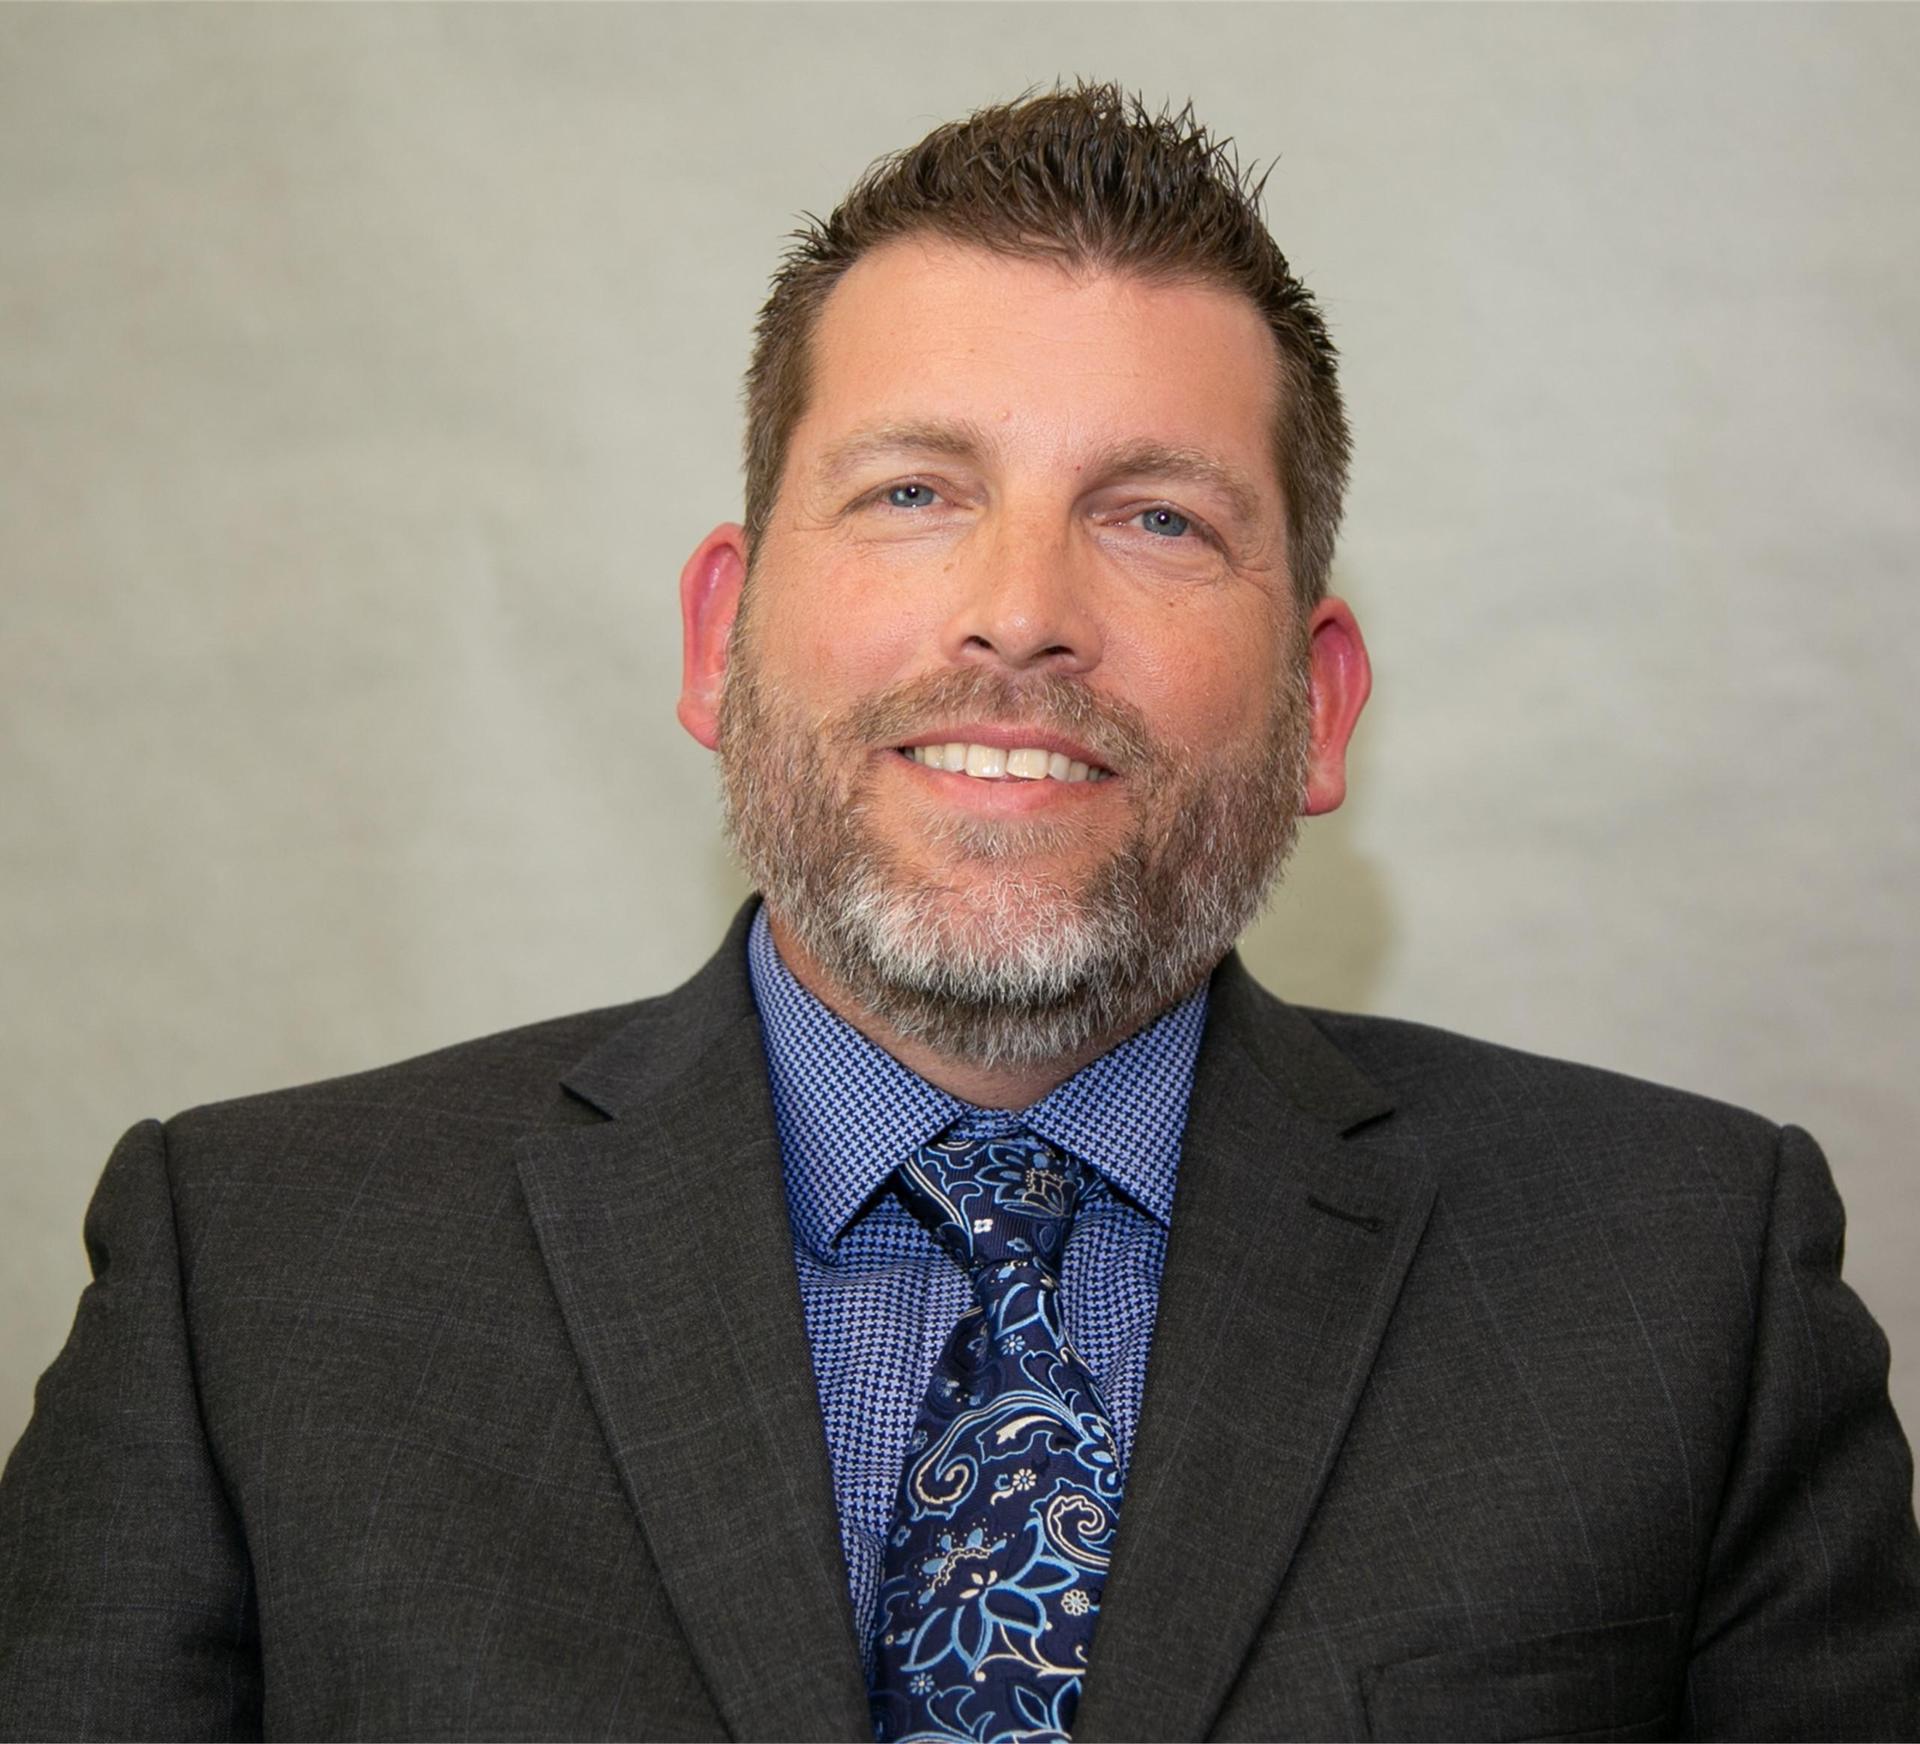 College and Career Director Jon Black